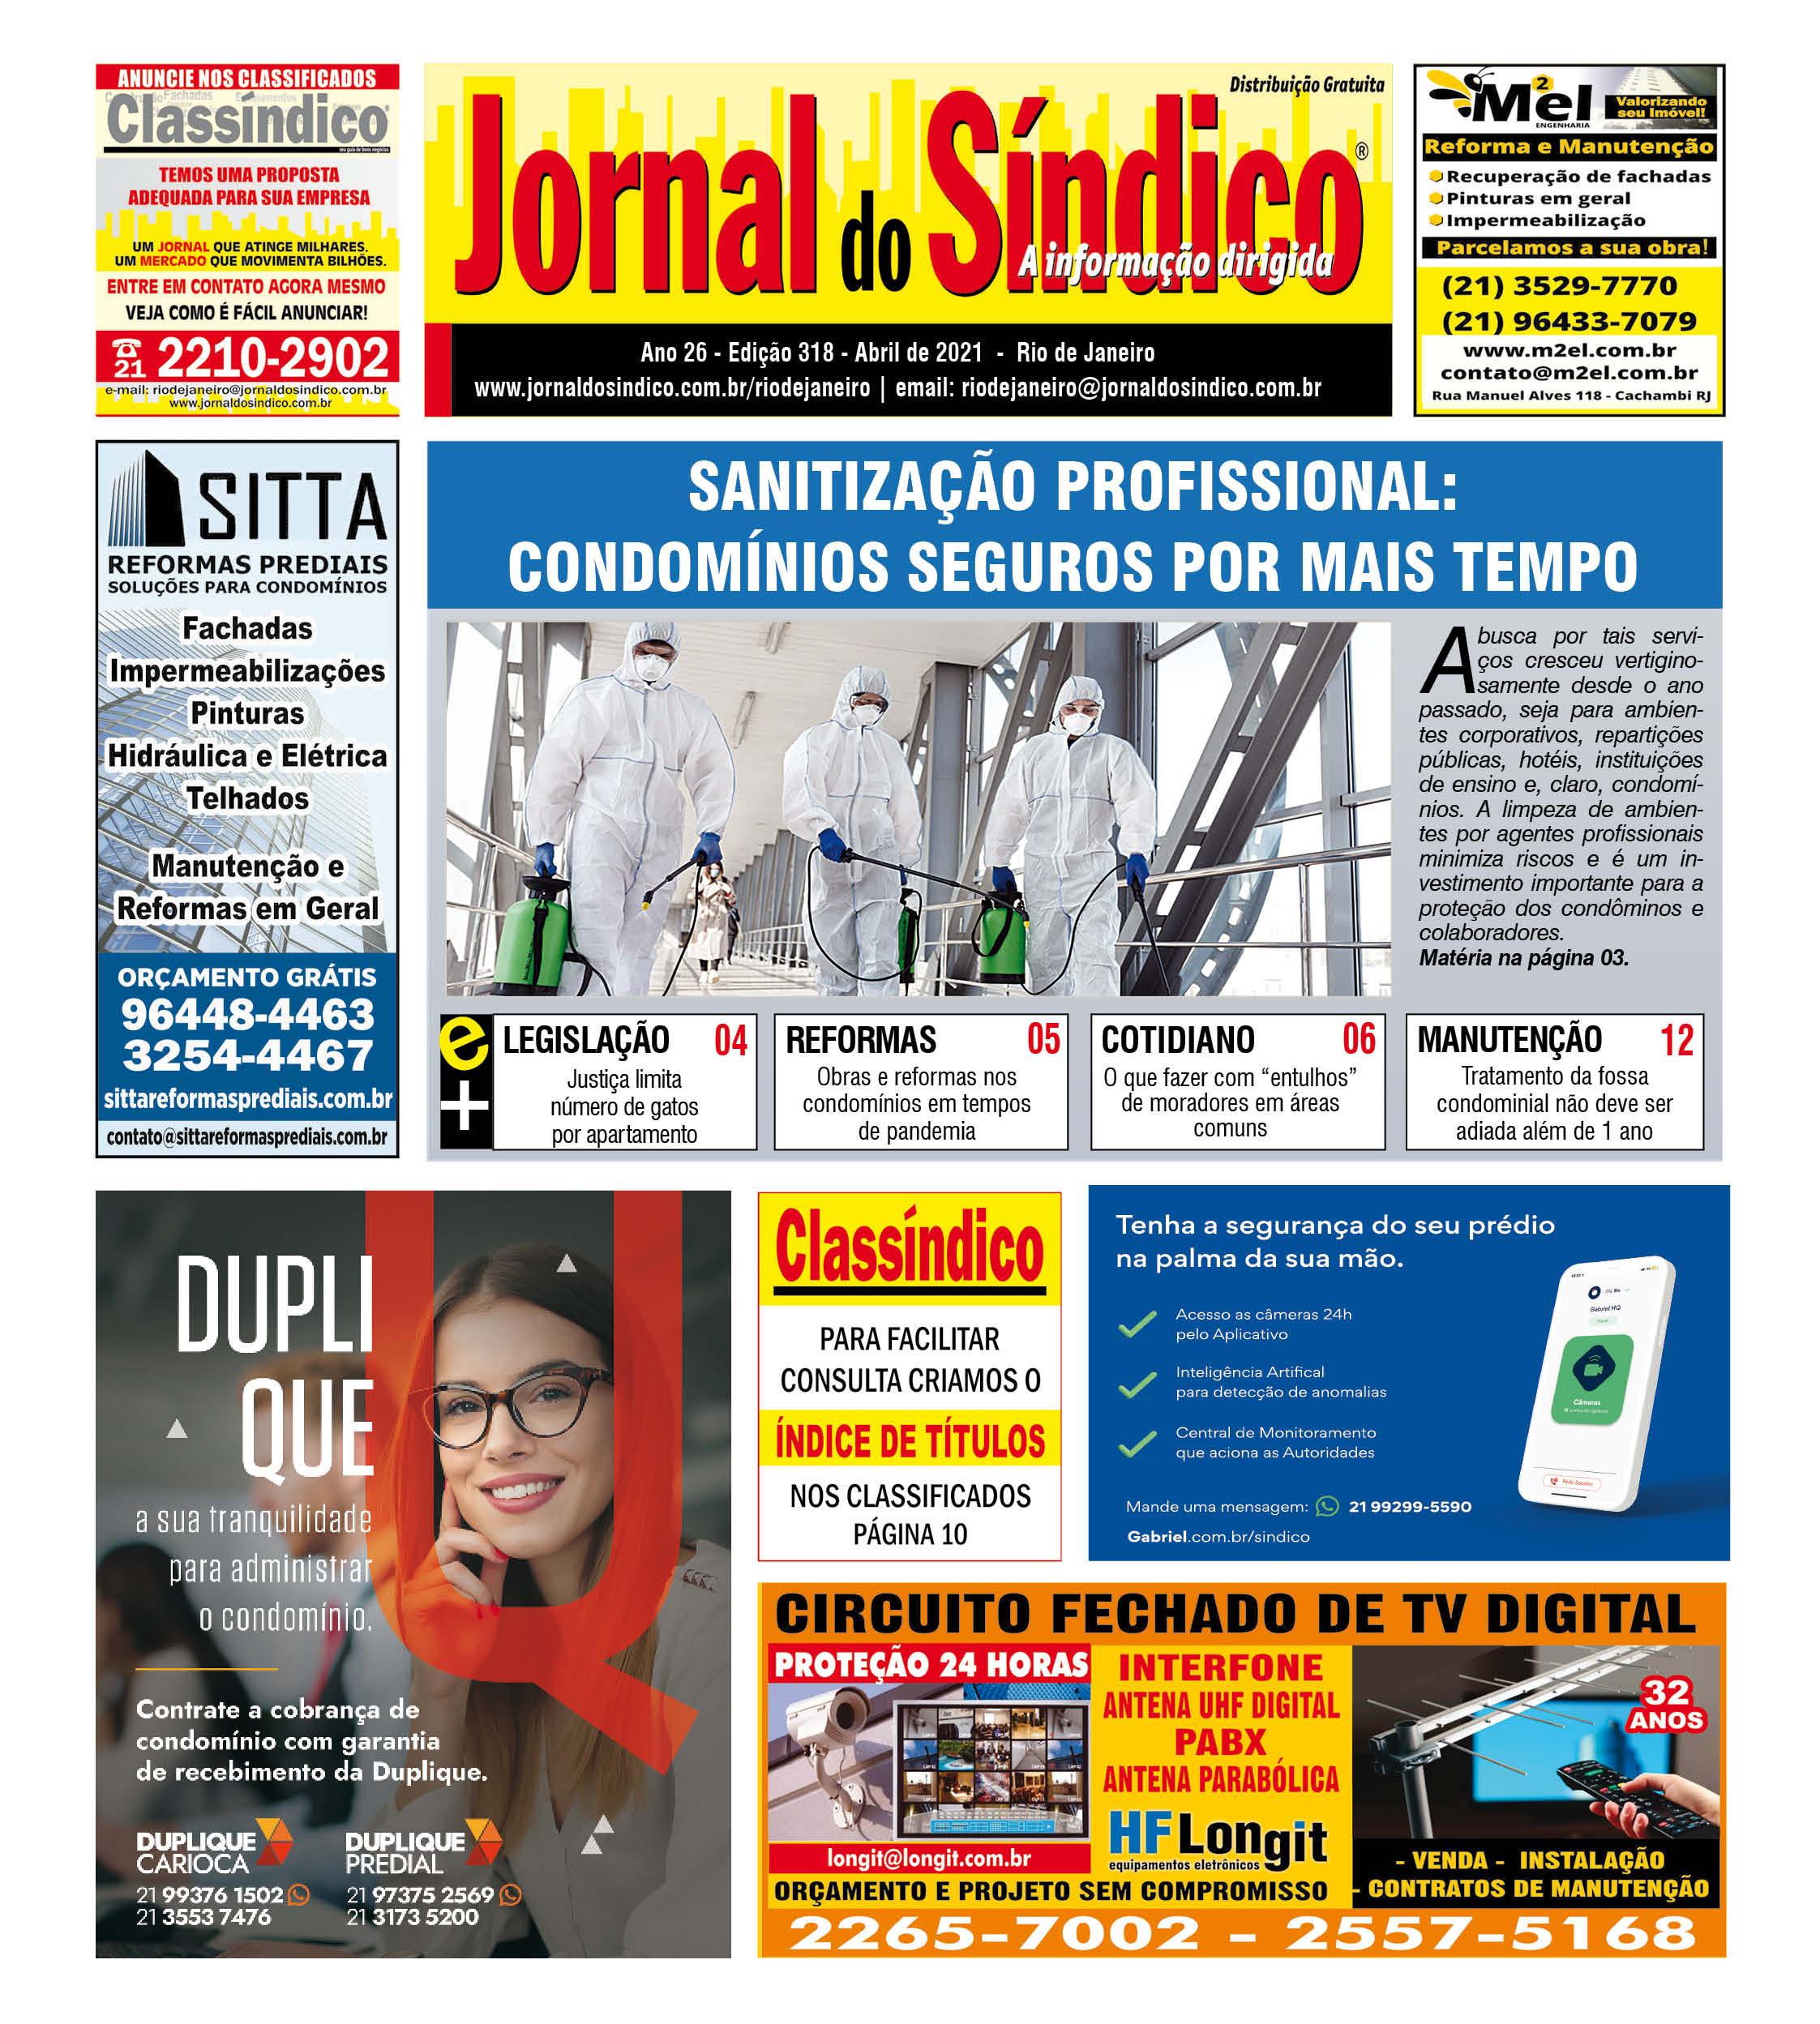 JSRJ 318 - ABRIL 2021 - 12 paginas WEB